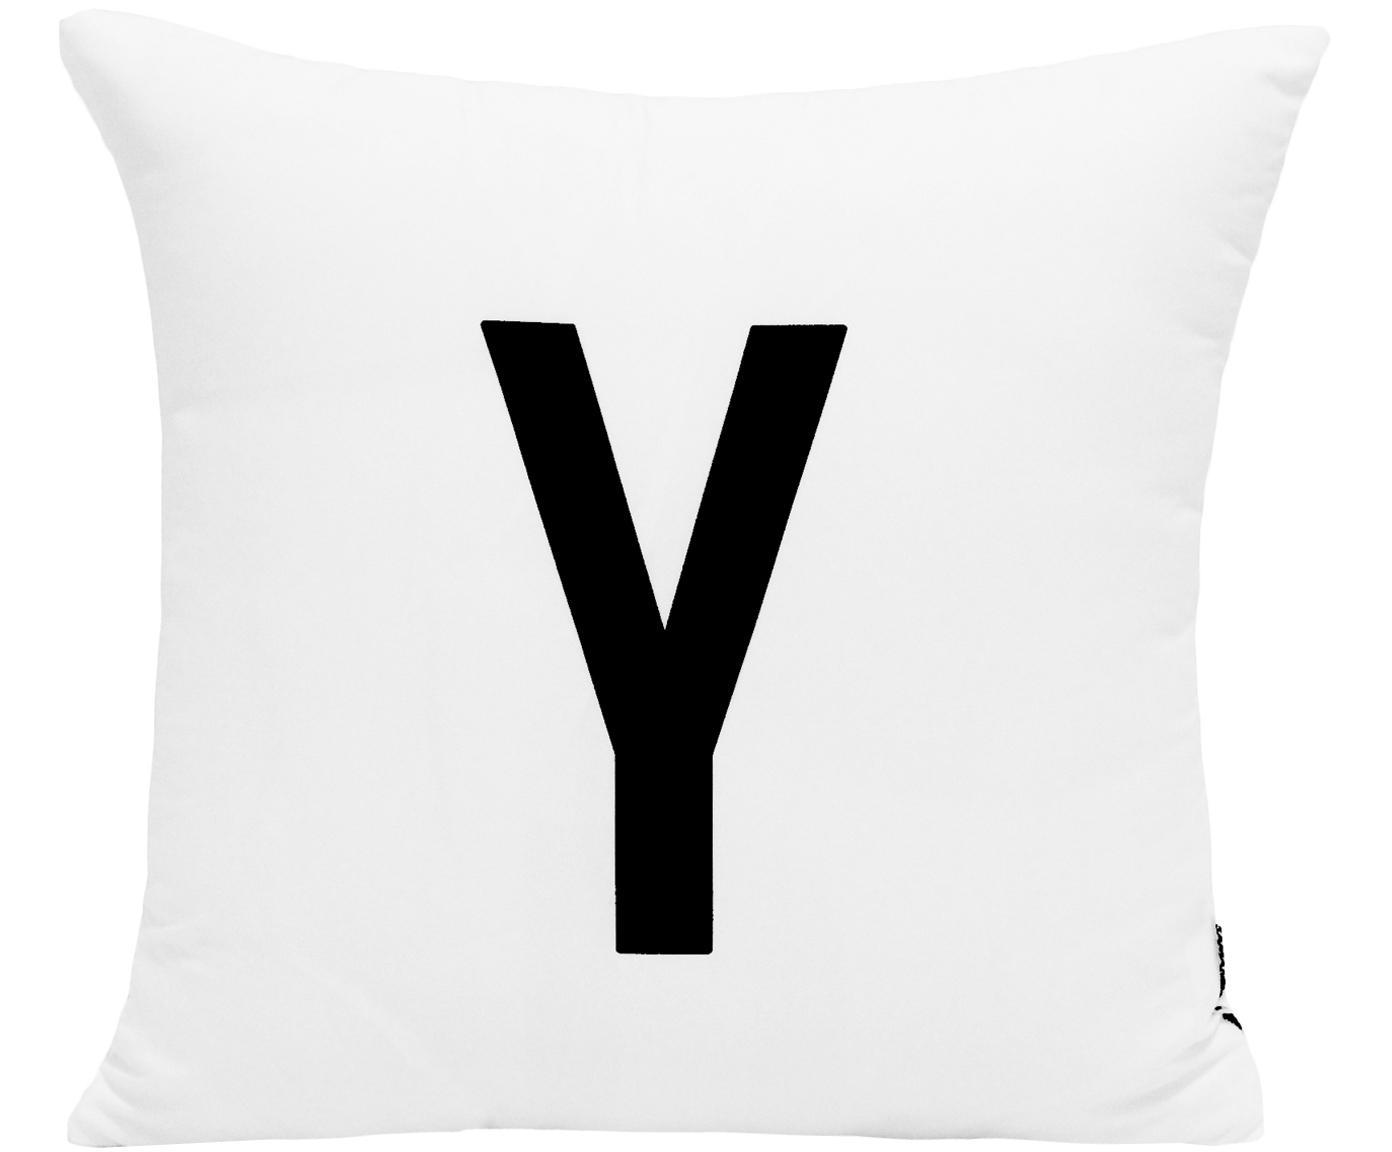 Funda de cojín Alphabet (variantes de A a Z), Poliéster, Negro, blanco, Variante Y